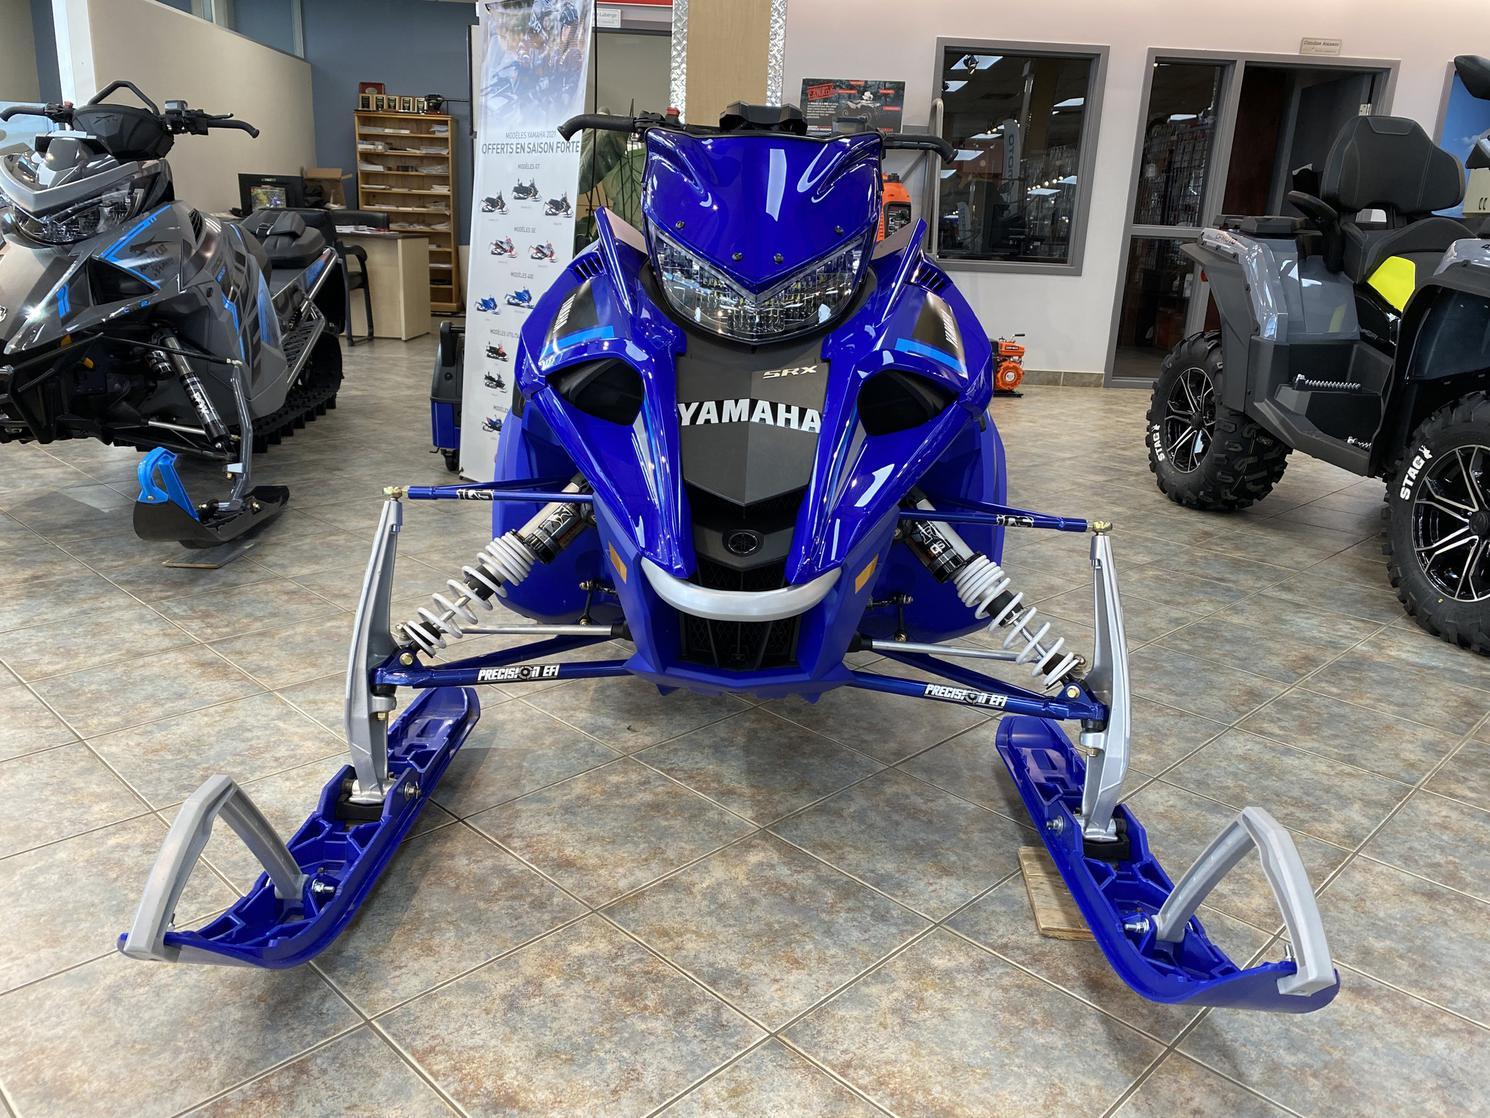 Yamaha Srx 2021 - Sidewinder